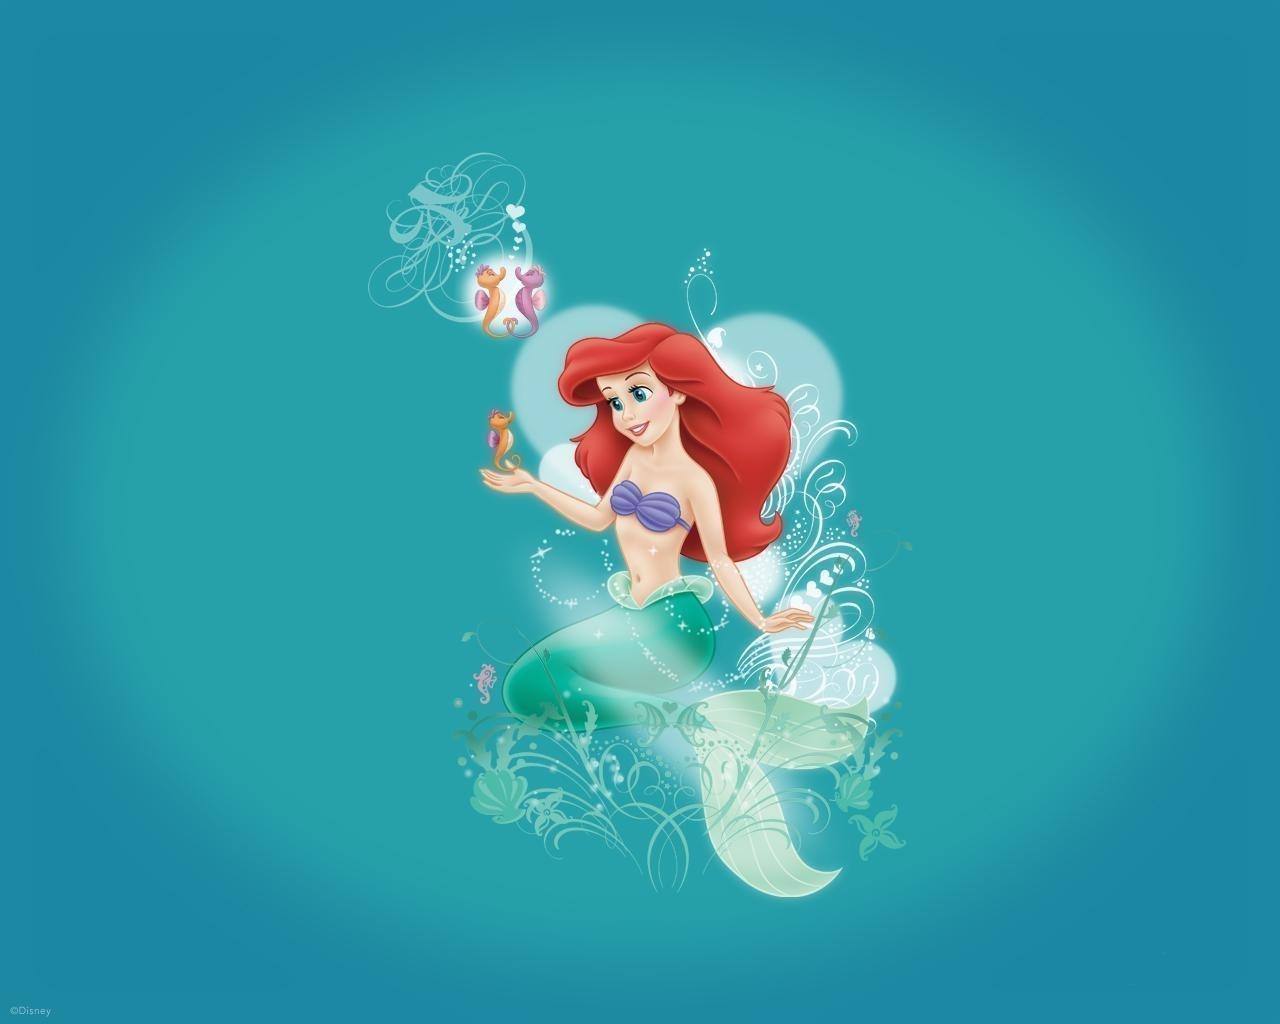 the little mermaid the little mermaid cartoon image wallpaper for